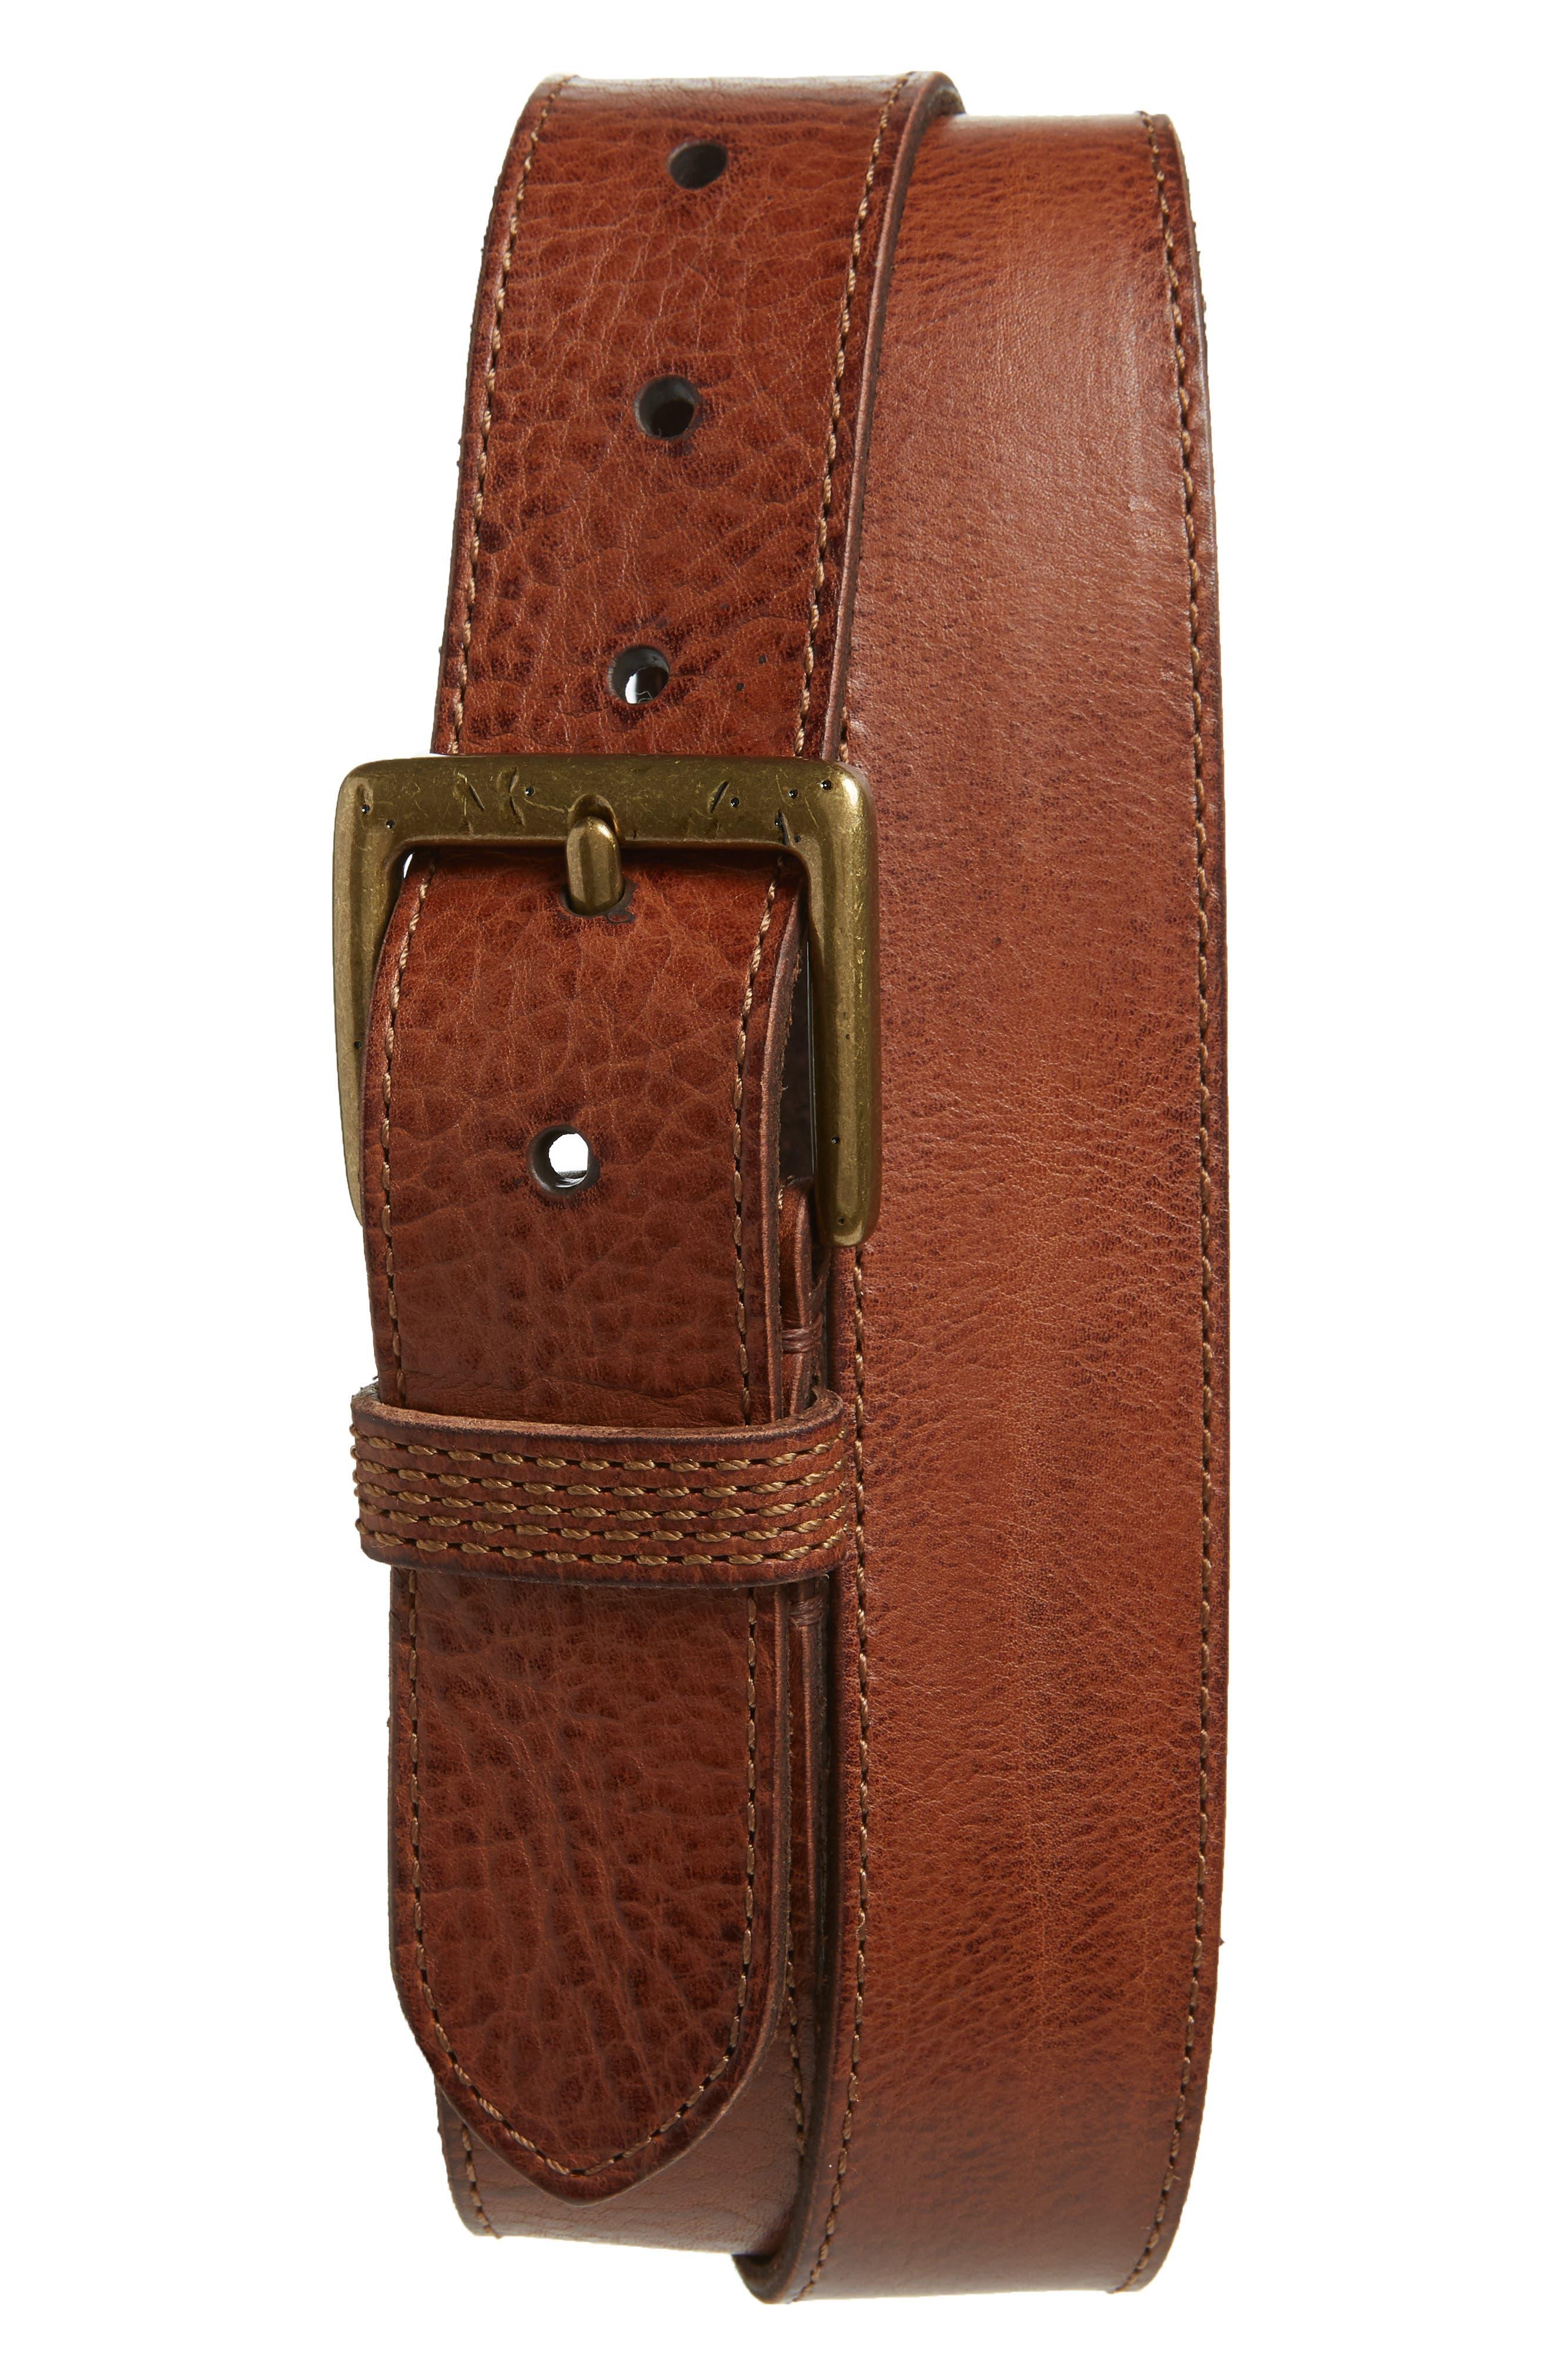 Frye Pebbled Leather Belt, Cognac